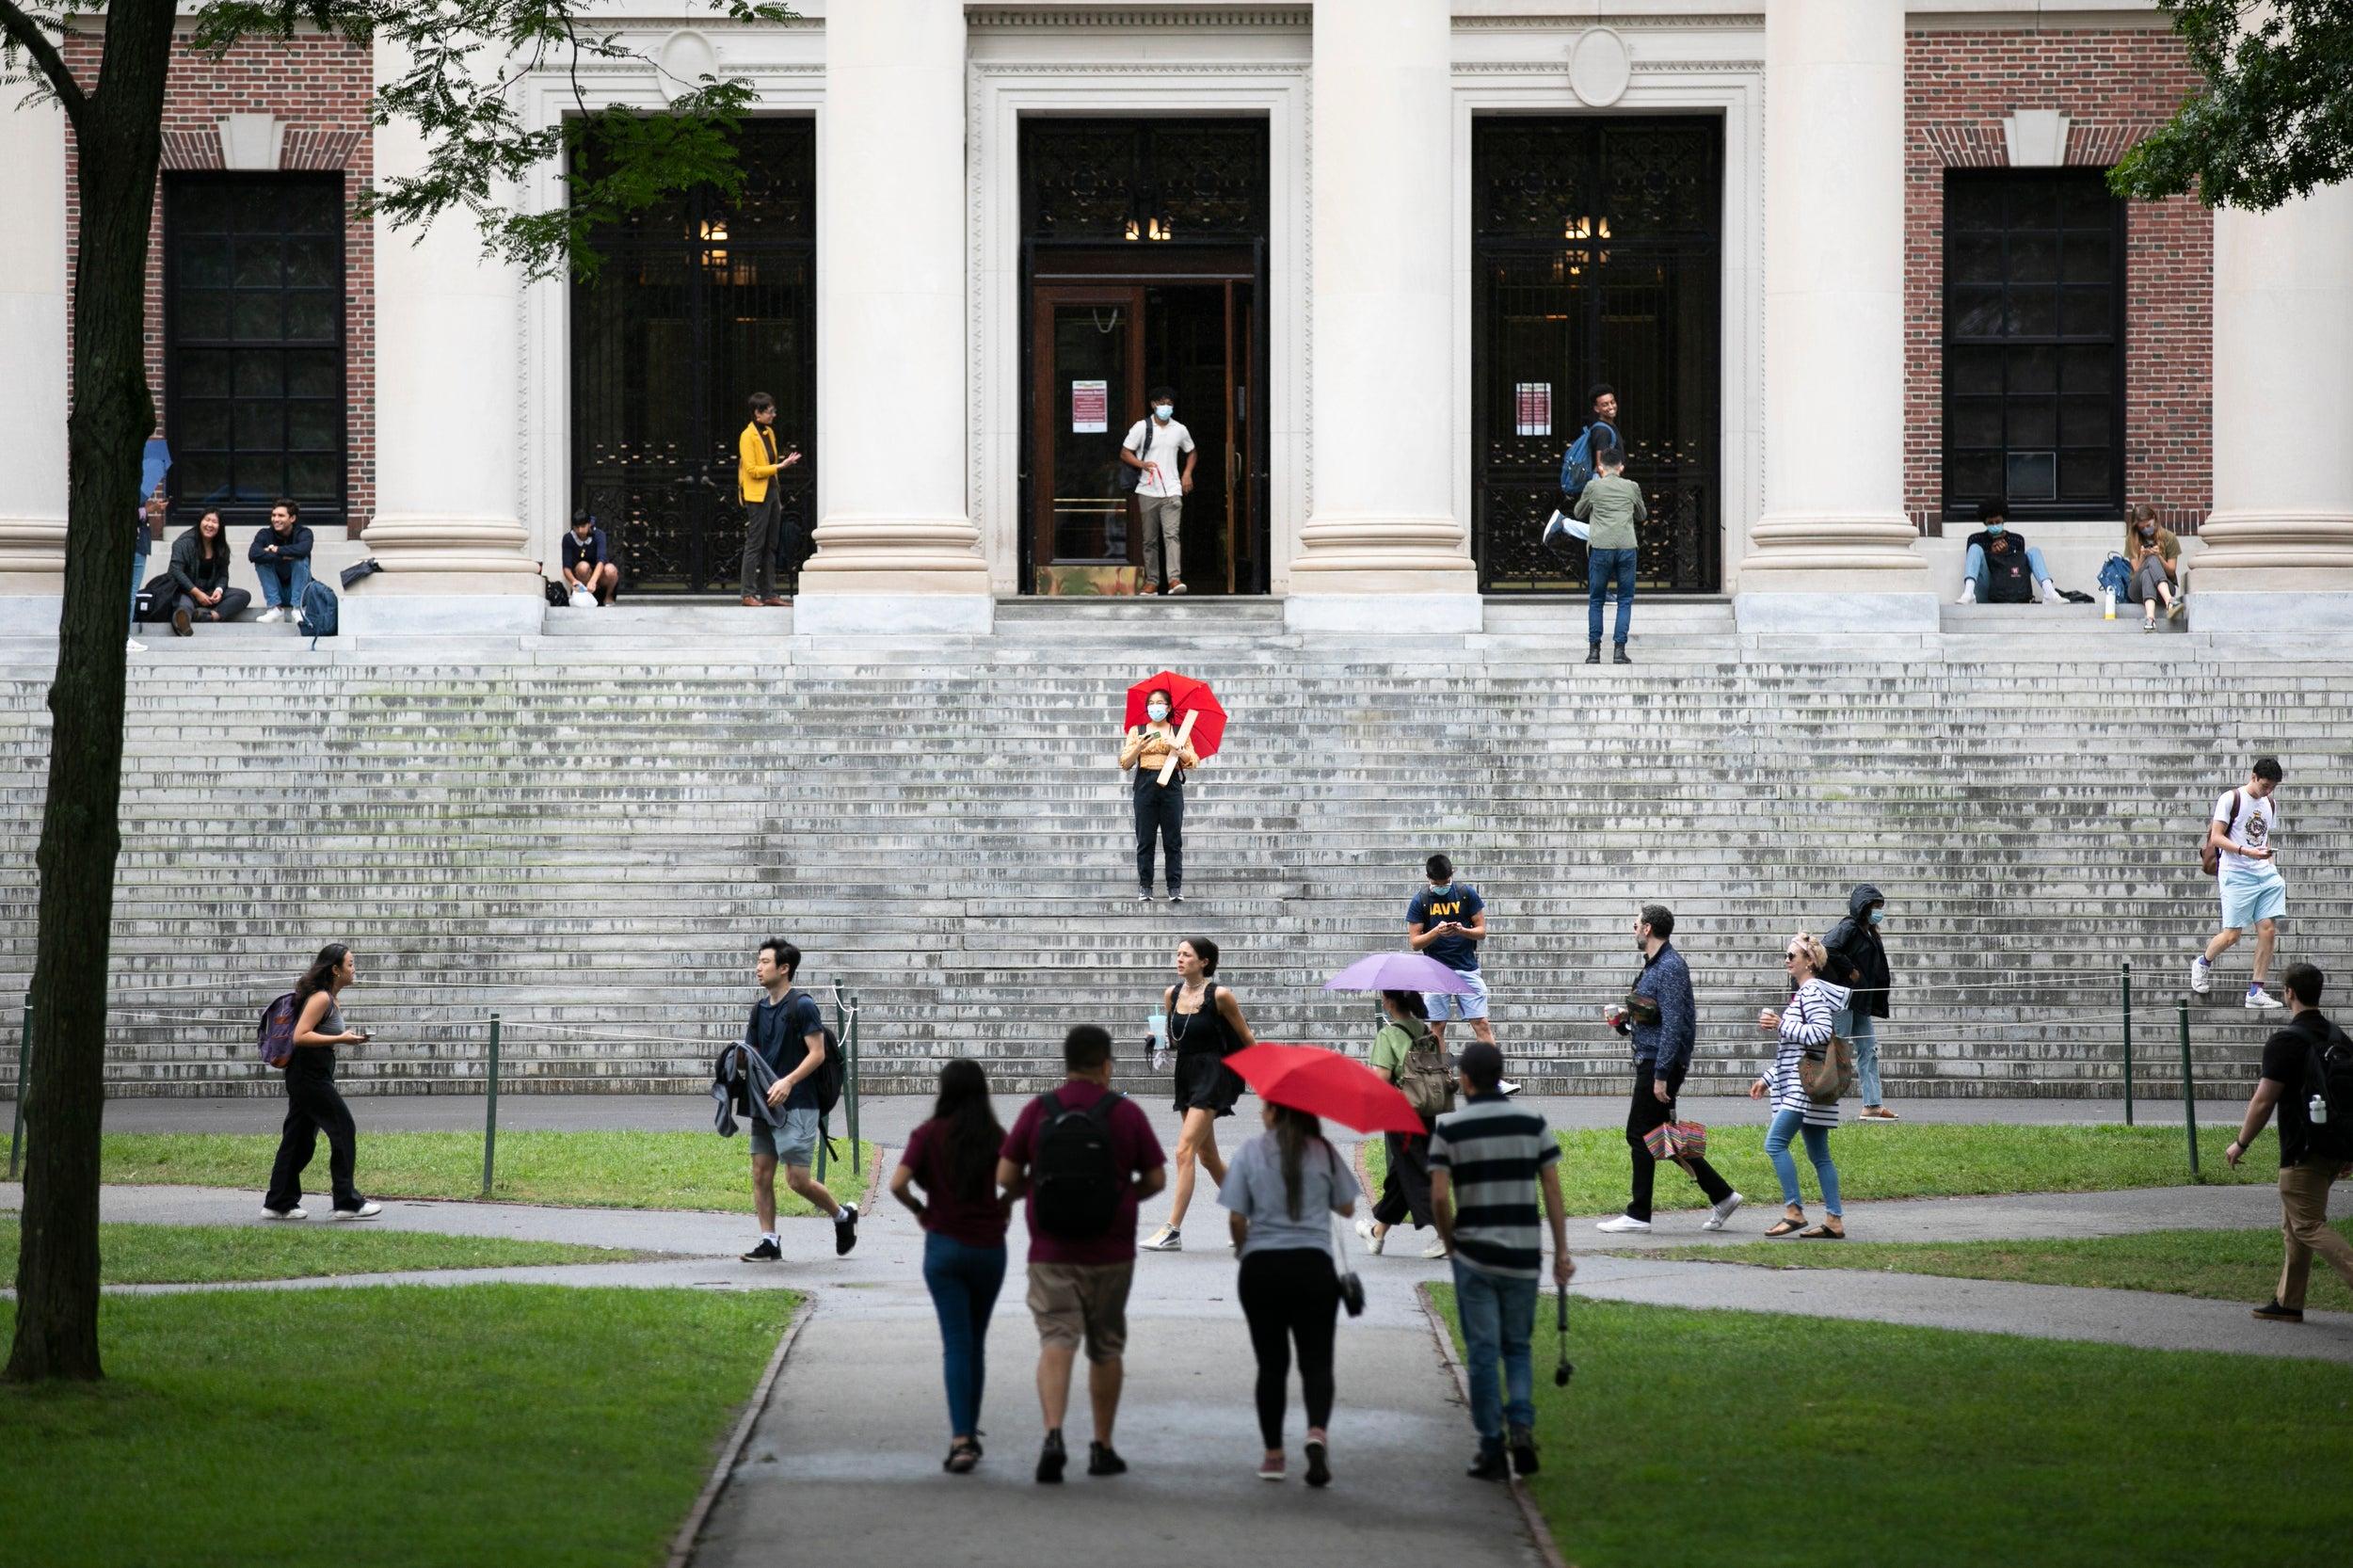 Students walk through Harvard Yard toward Widener Library.